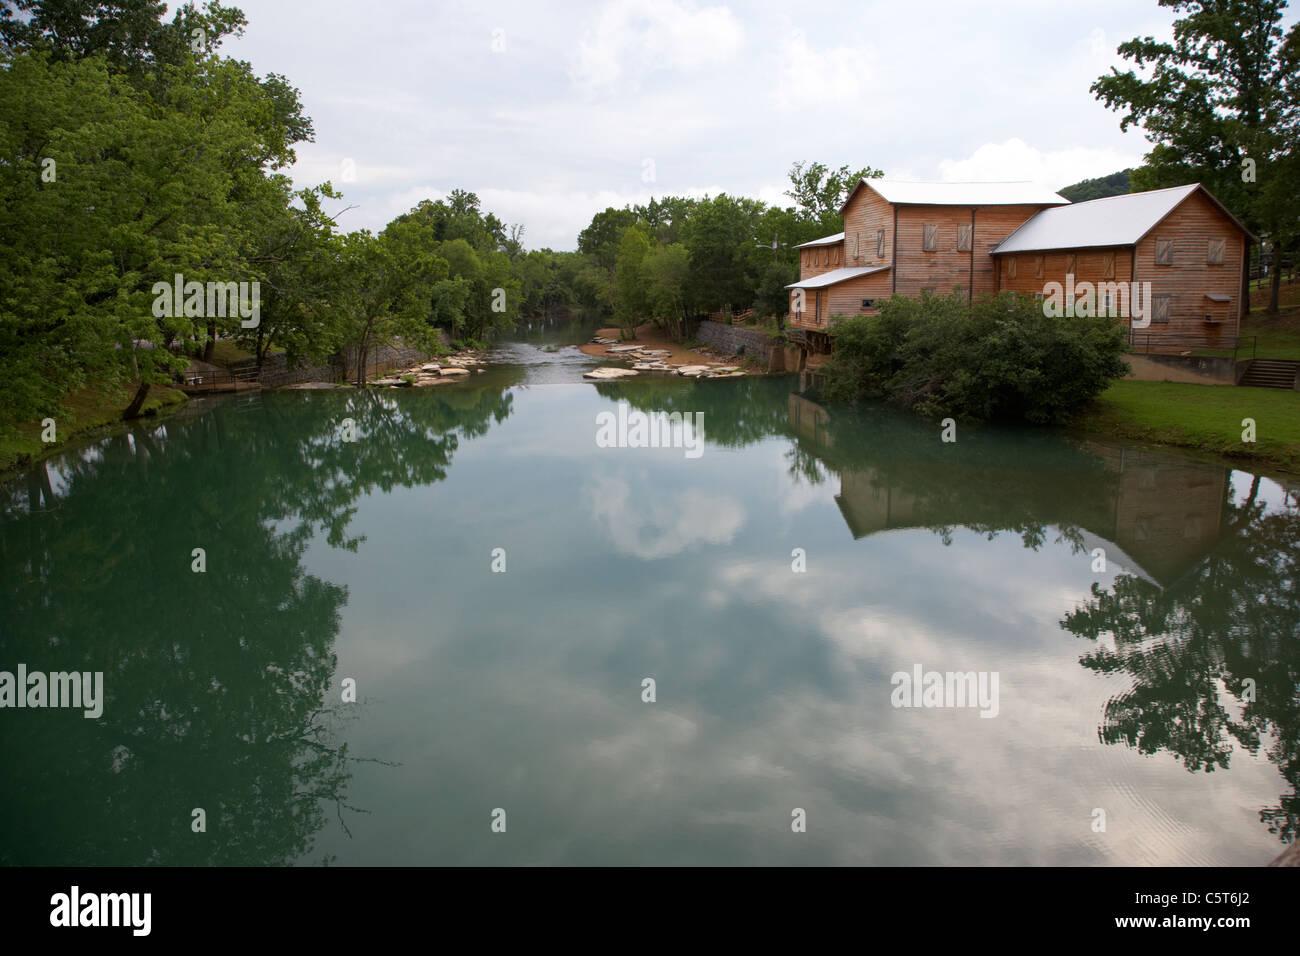 Loretta Stockfotos & Loretta Bilder - Alamy